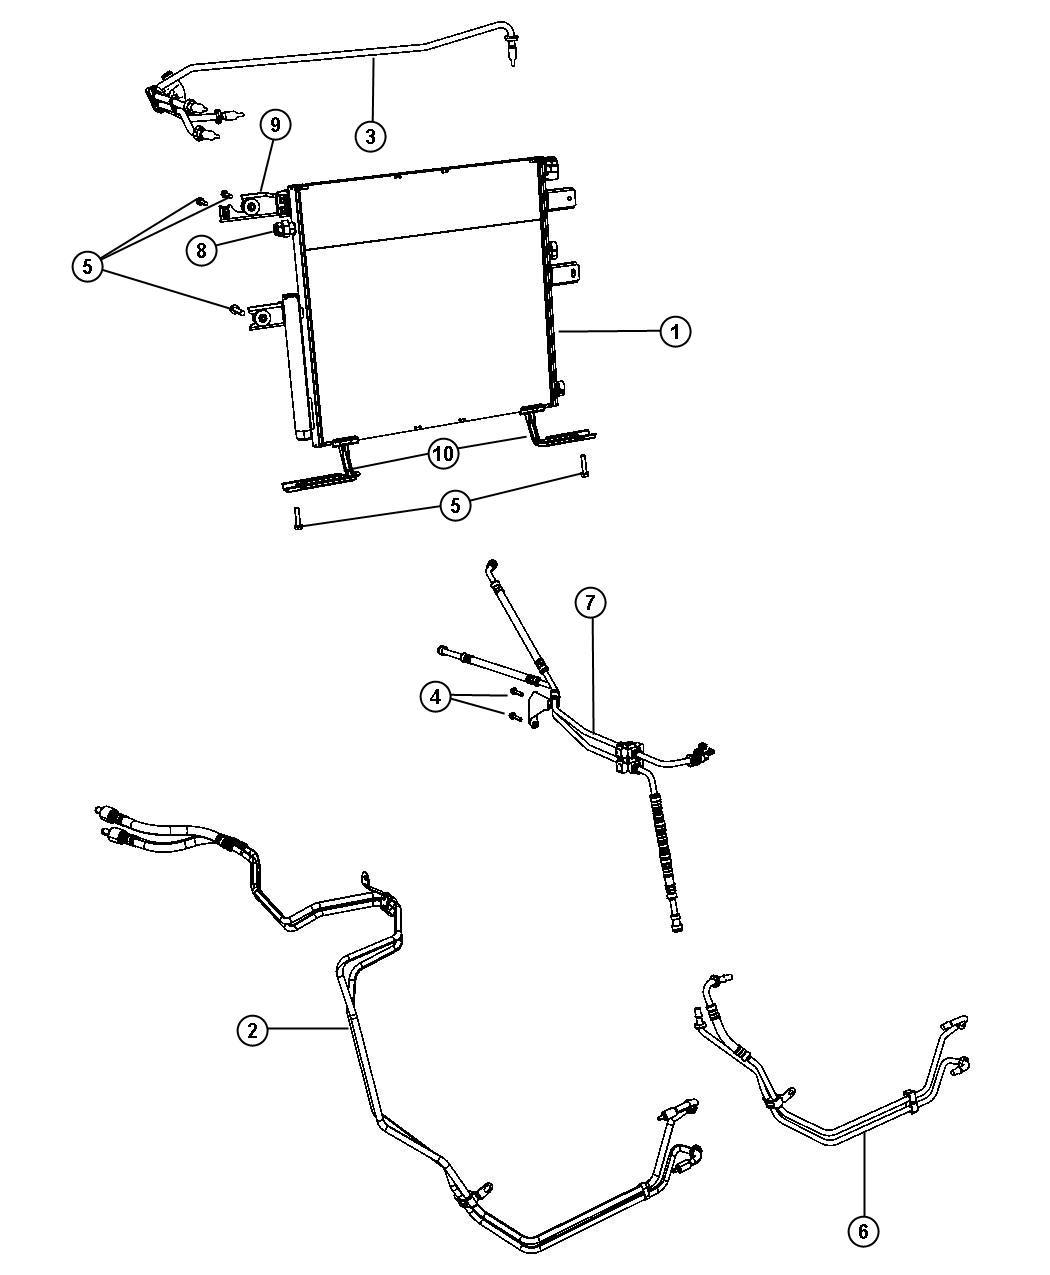 Dodge Caliber Glove Box Cooler, Dodge, Free Engine Image